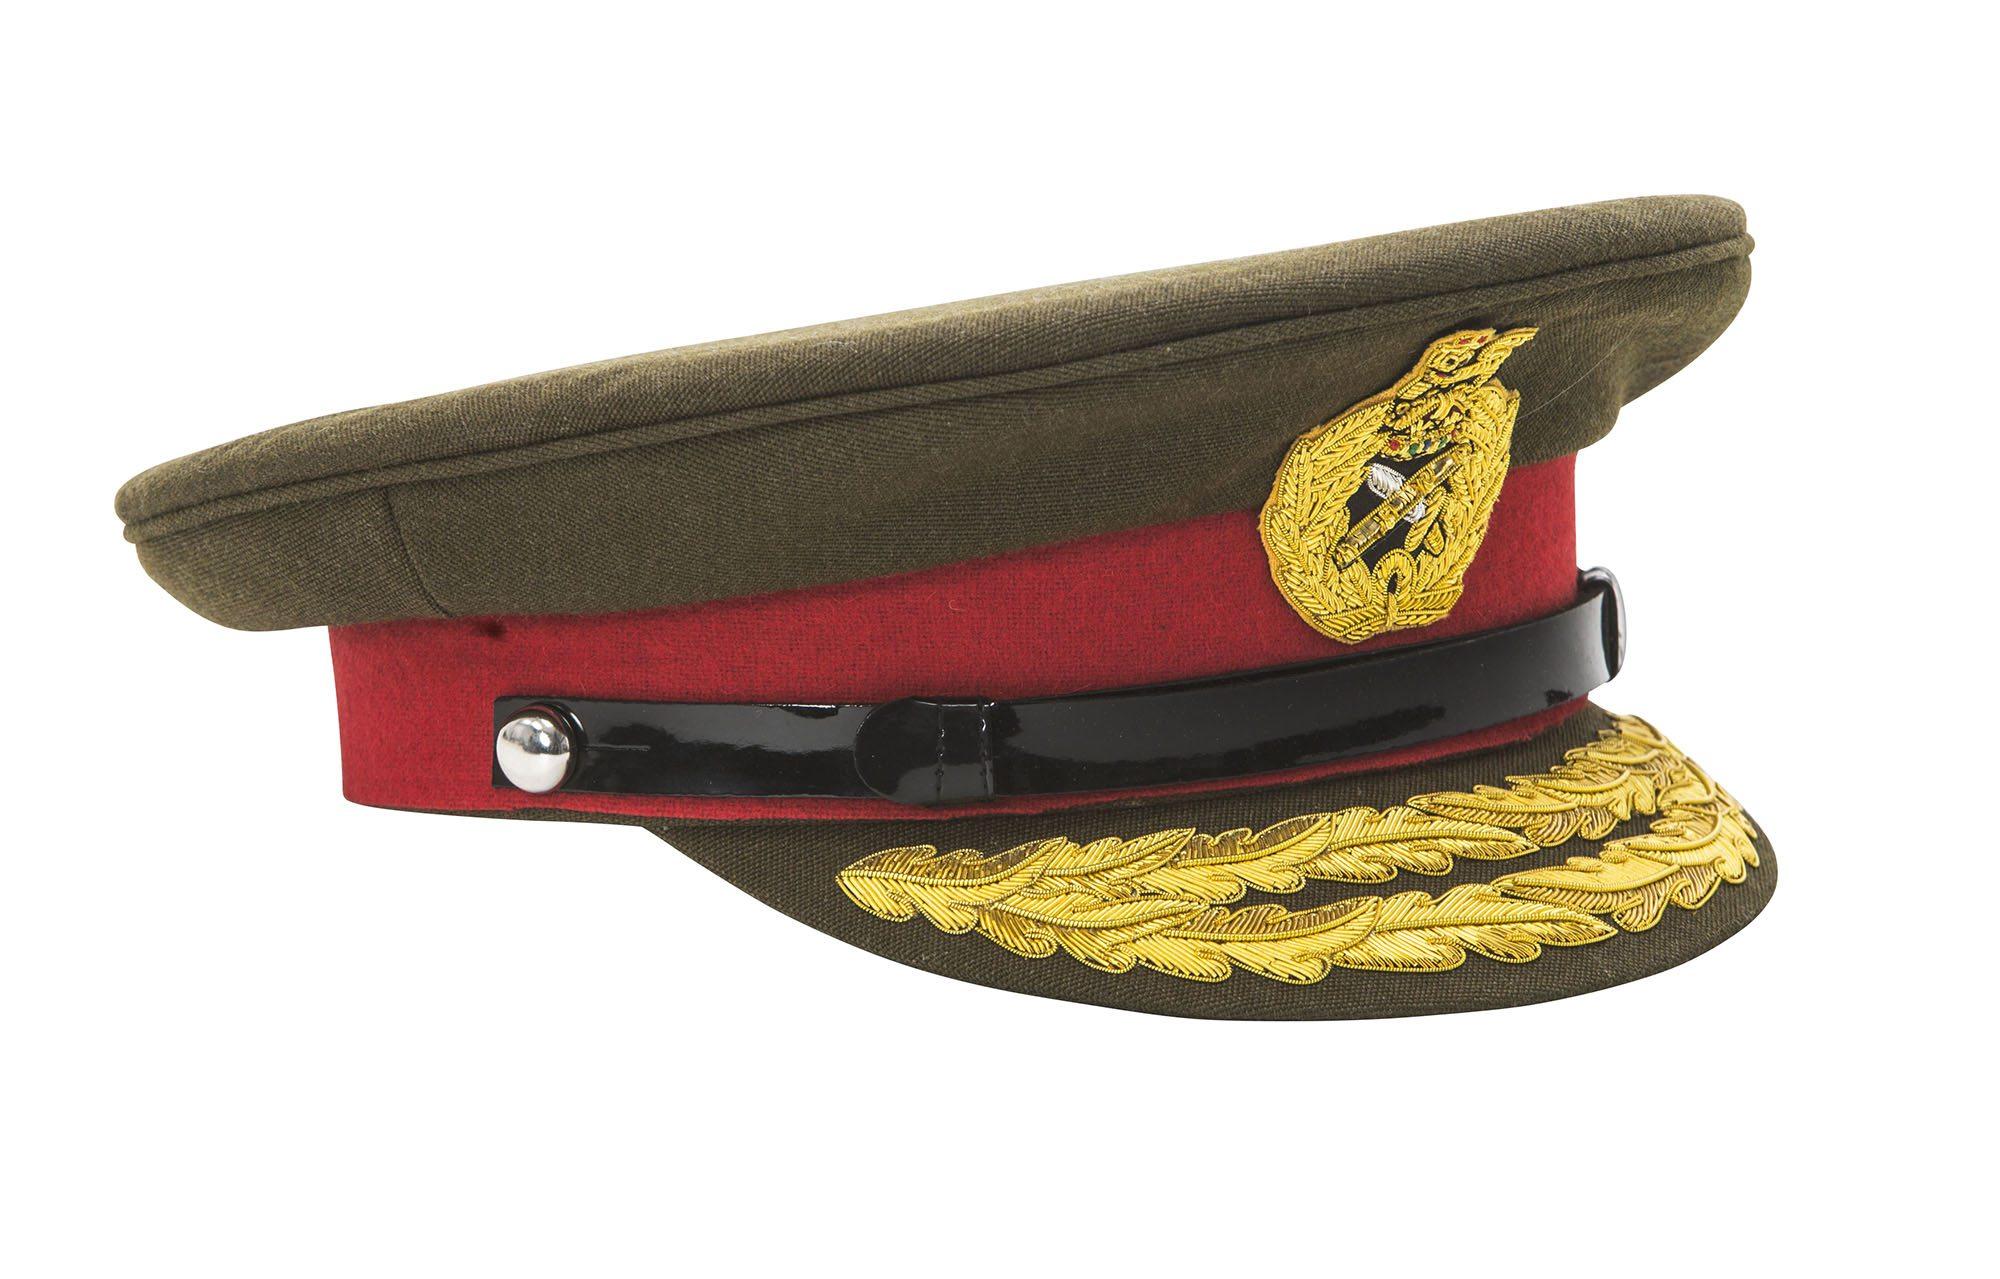 WW1 WW2 British army Field Marshall visor cap